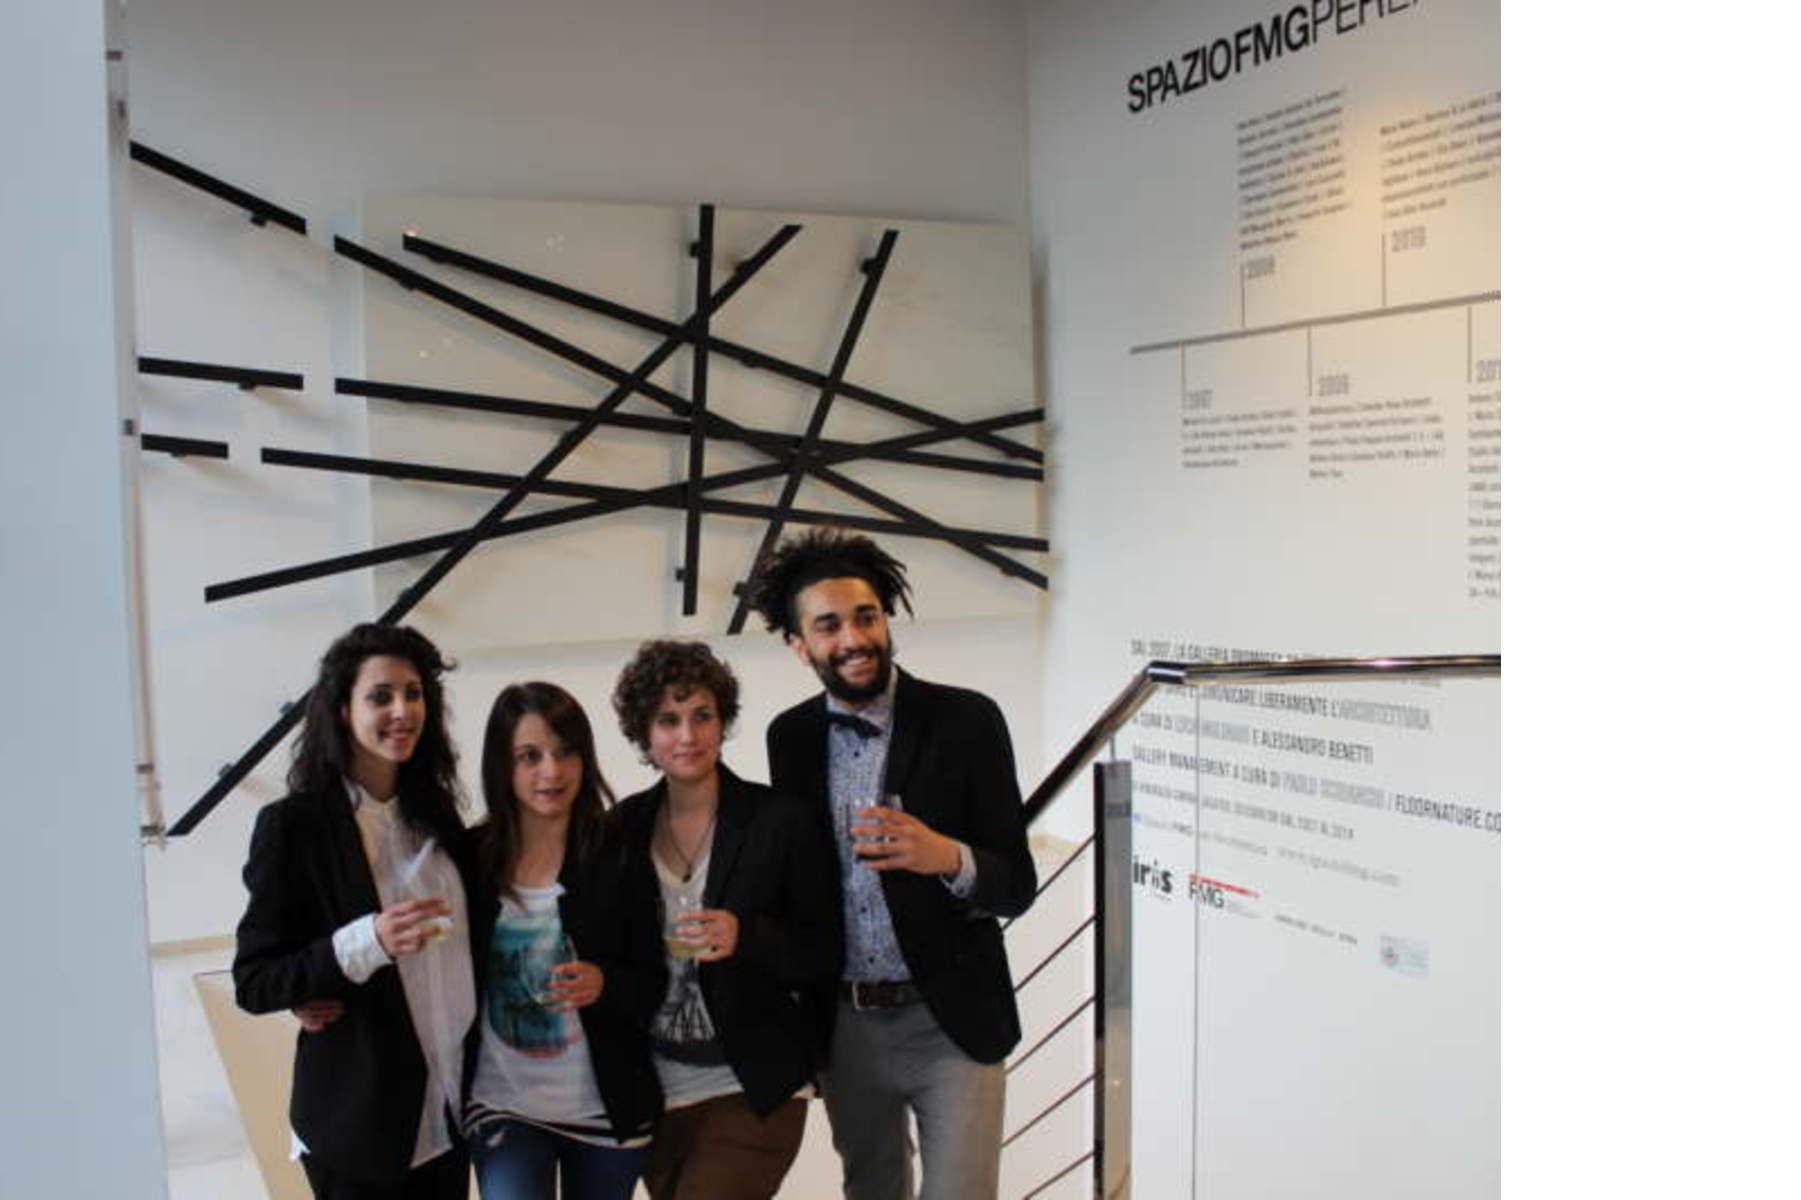 new SpazIOFMG corporate identity Fuorisalone 2015 Events